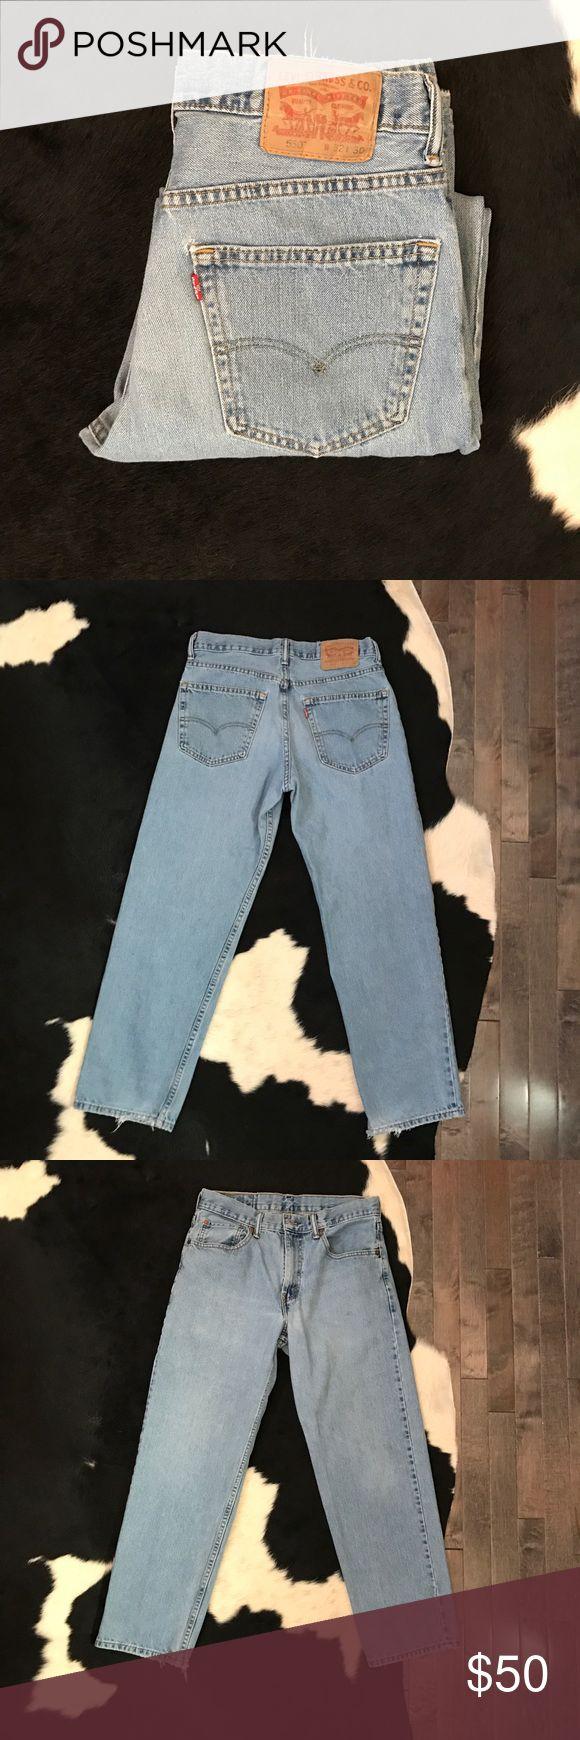 Vintage Levi's 550 high waist jeans Vintage 550 Levi's high waisted jeans with a 30 inch waist Levi's Jeans Skinny